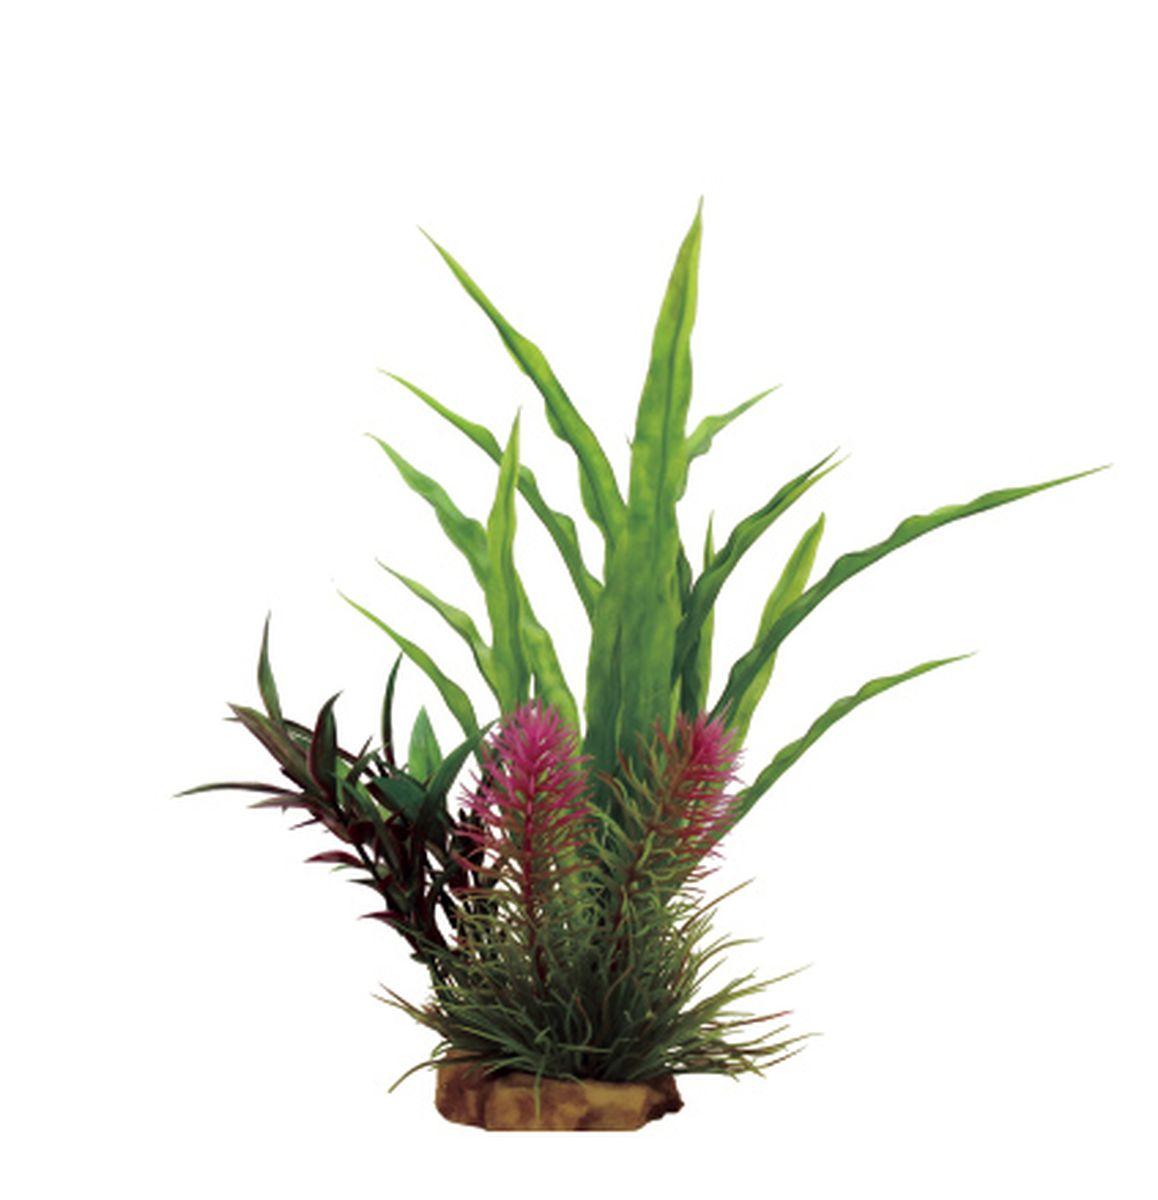 Композиция из растений для аквариума ArtUniq Криптокорина, 16 x 15 x 22 см декорация для аквариума artuniq пористый камень 20 5 x 10 5 x 18 8 см